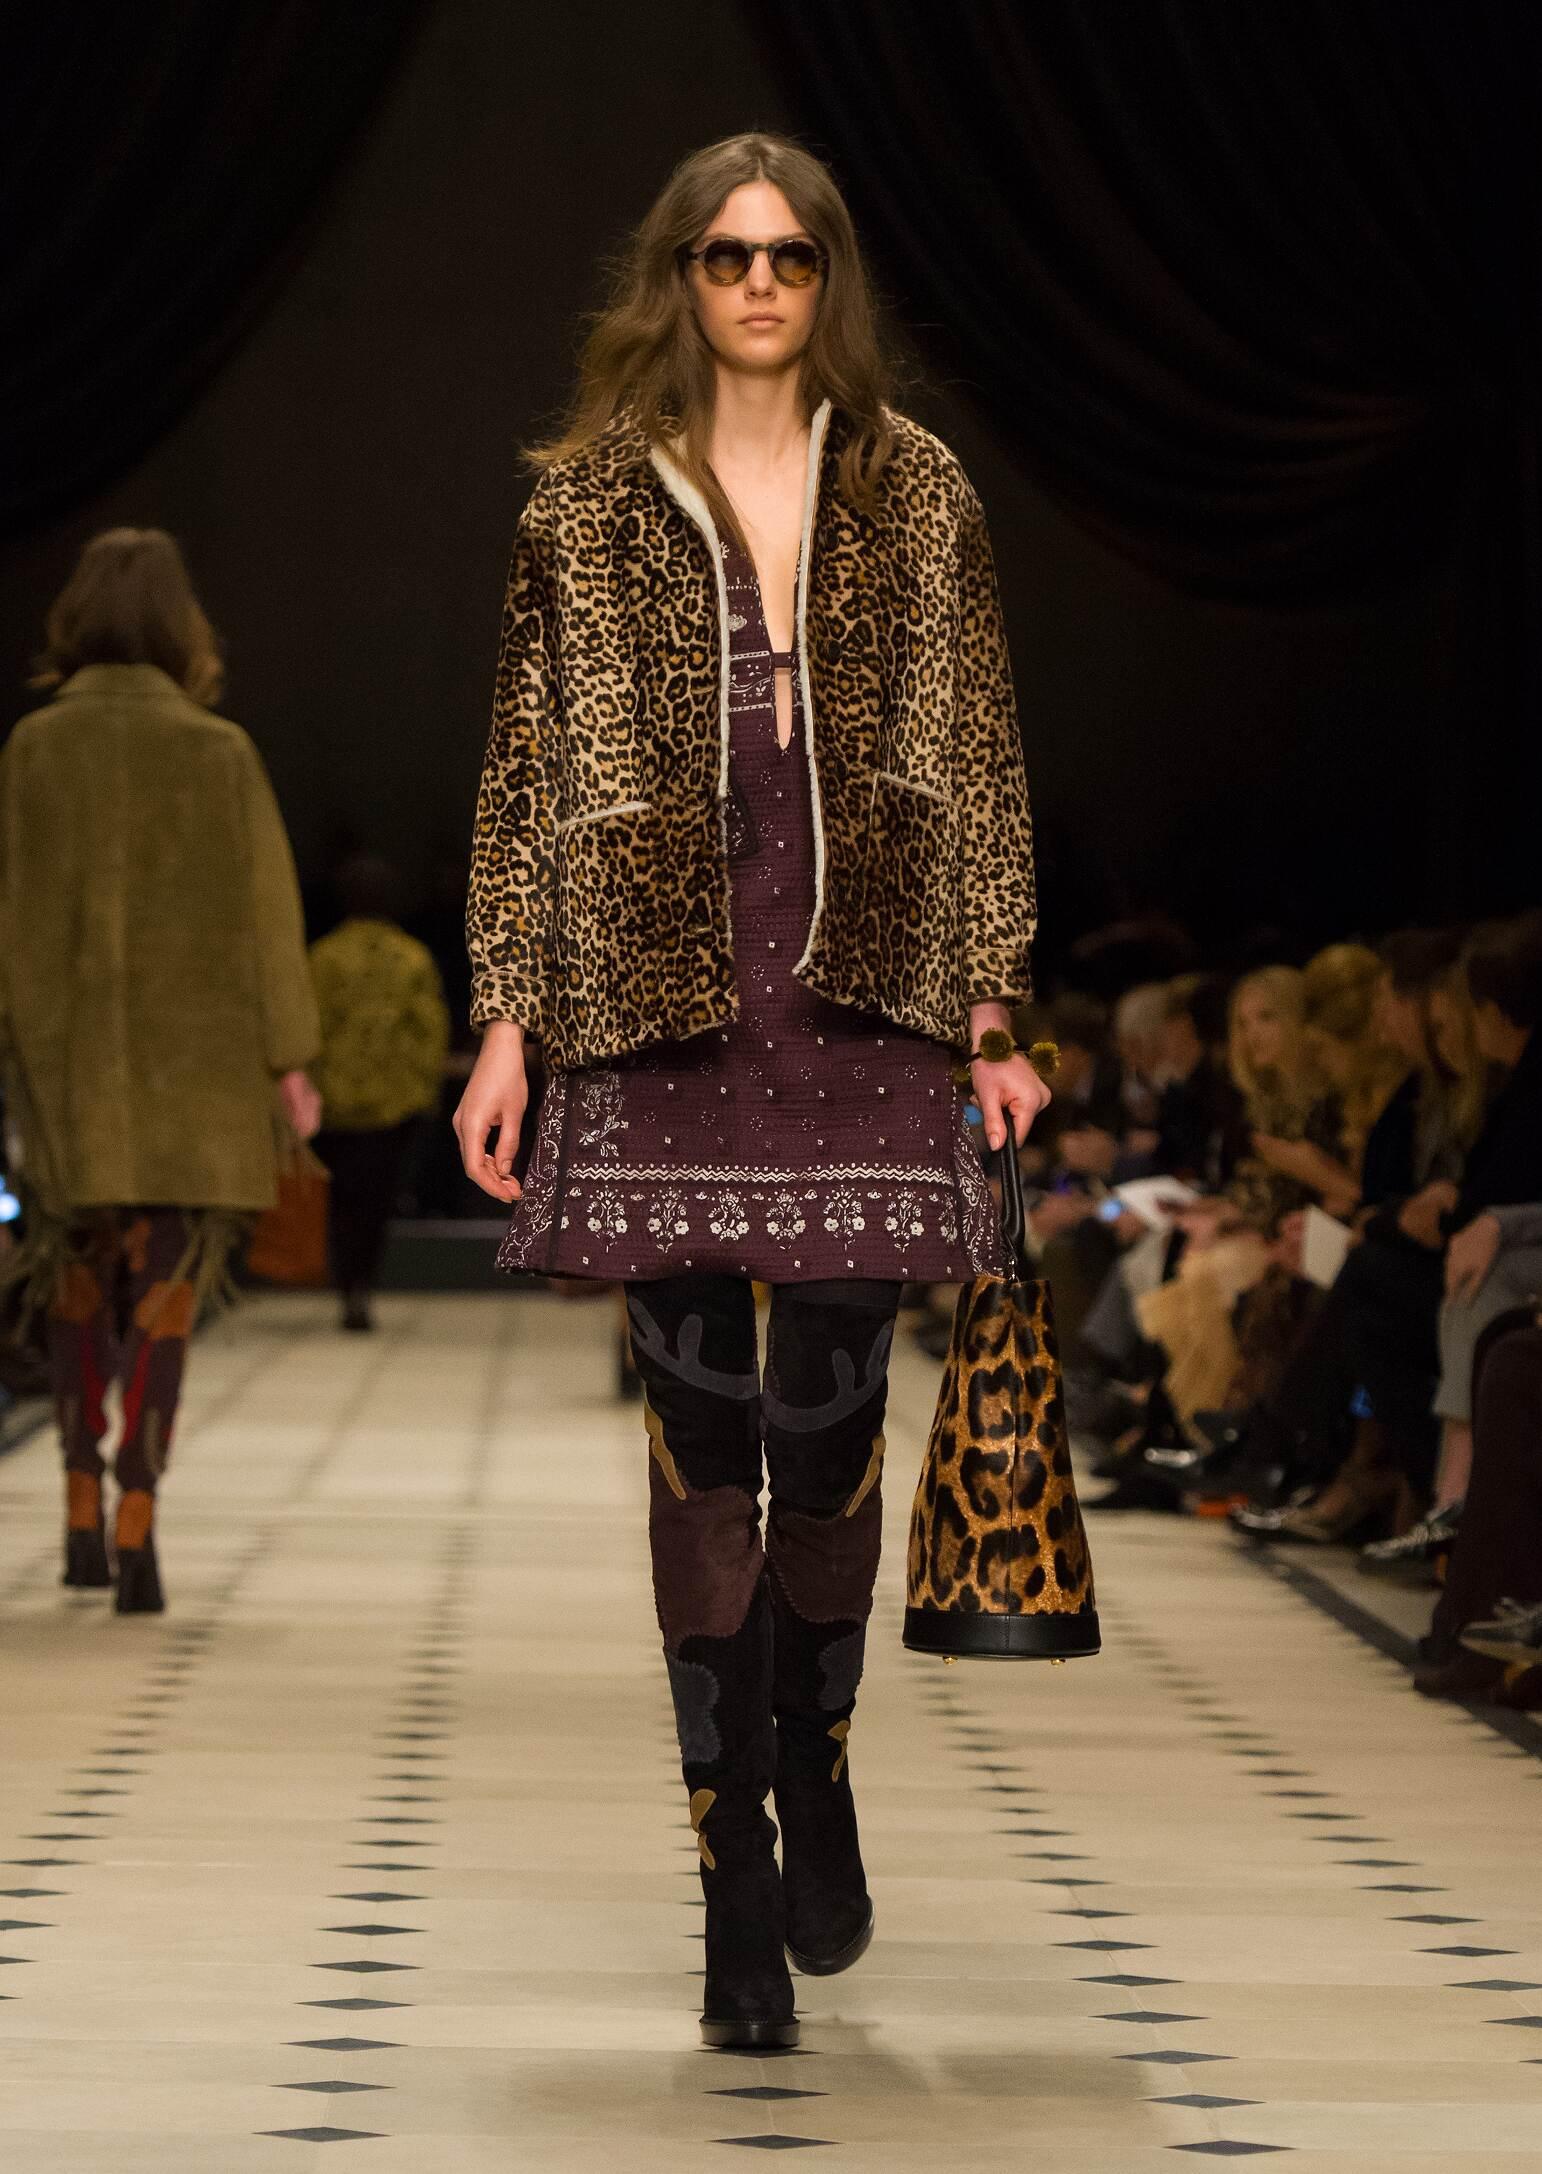 Burberry Prorsum Collection Winter 2015 Catwalk